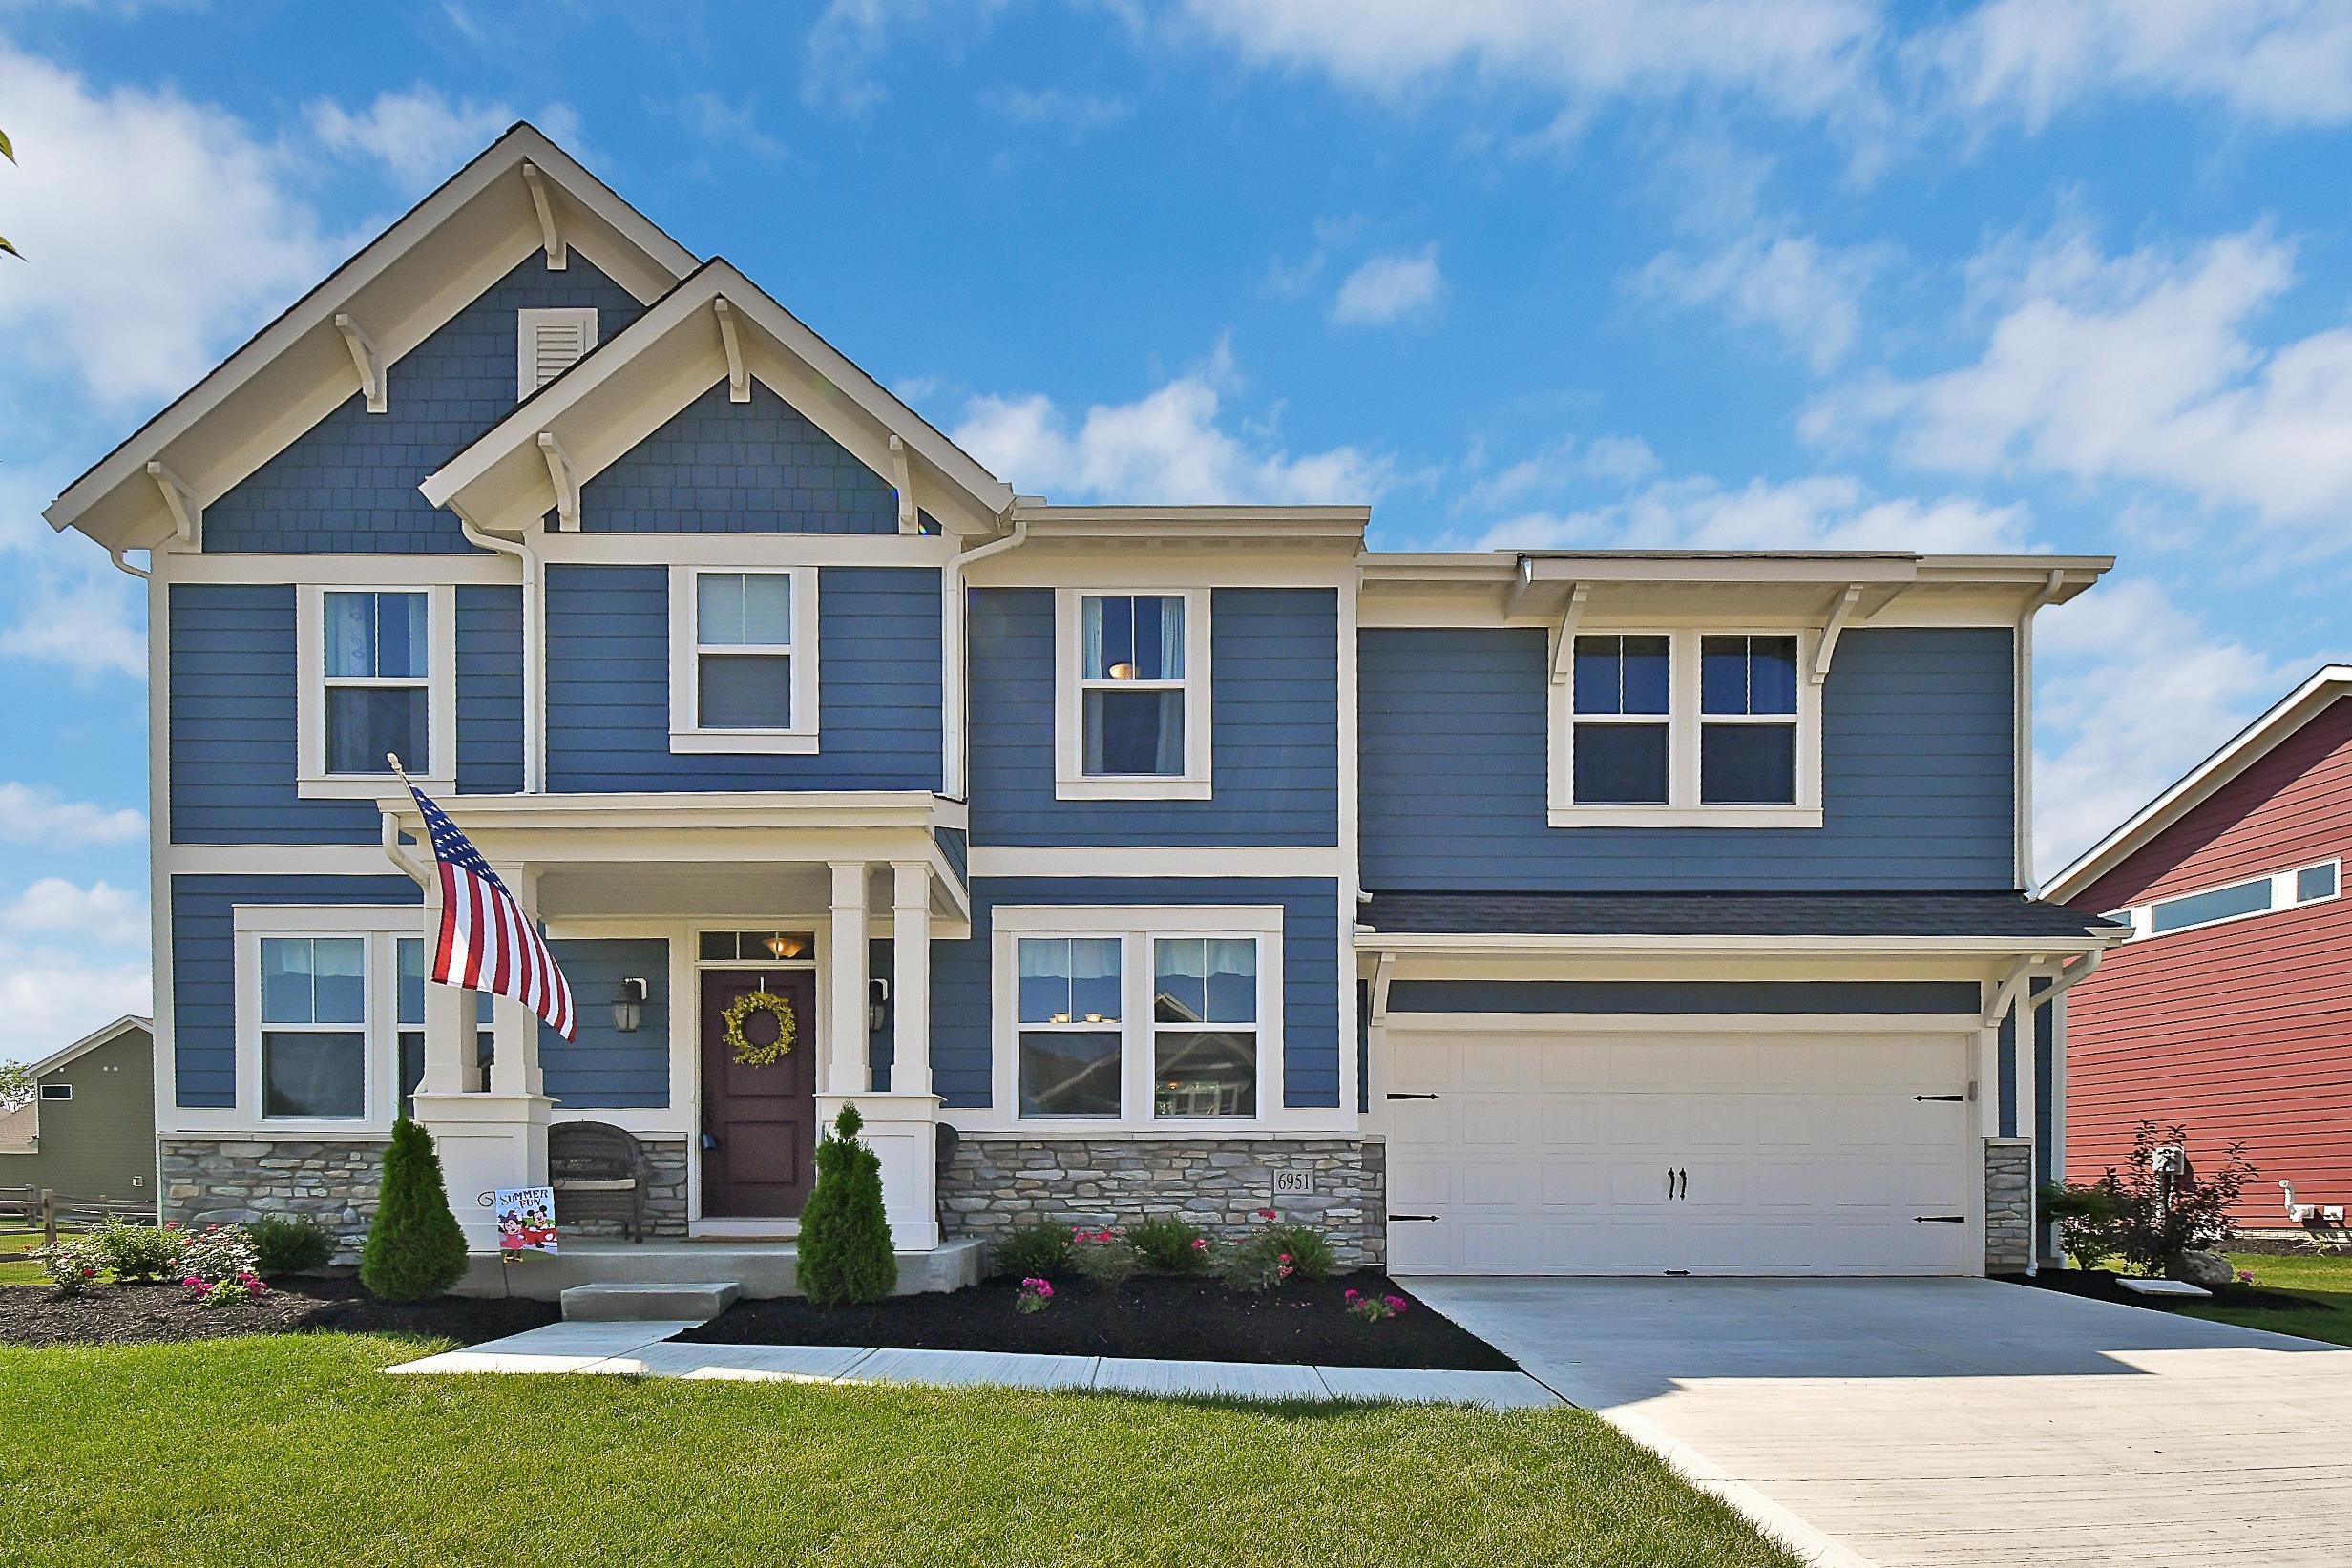 Photo of 6951 Scarlet Oak Drive, Hilliard, OH 43026